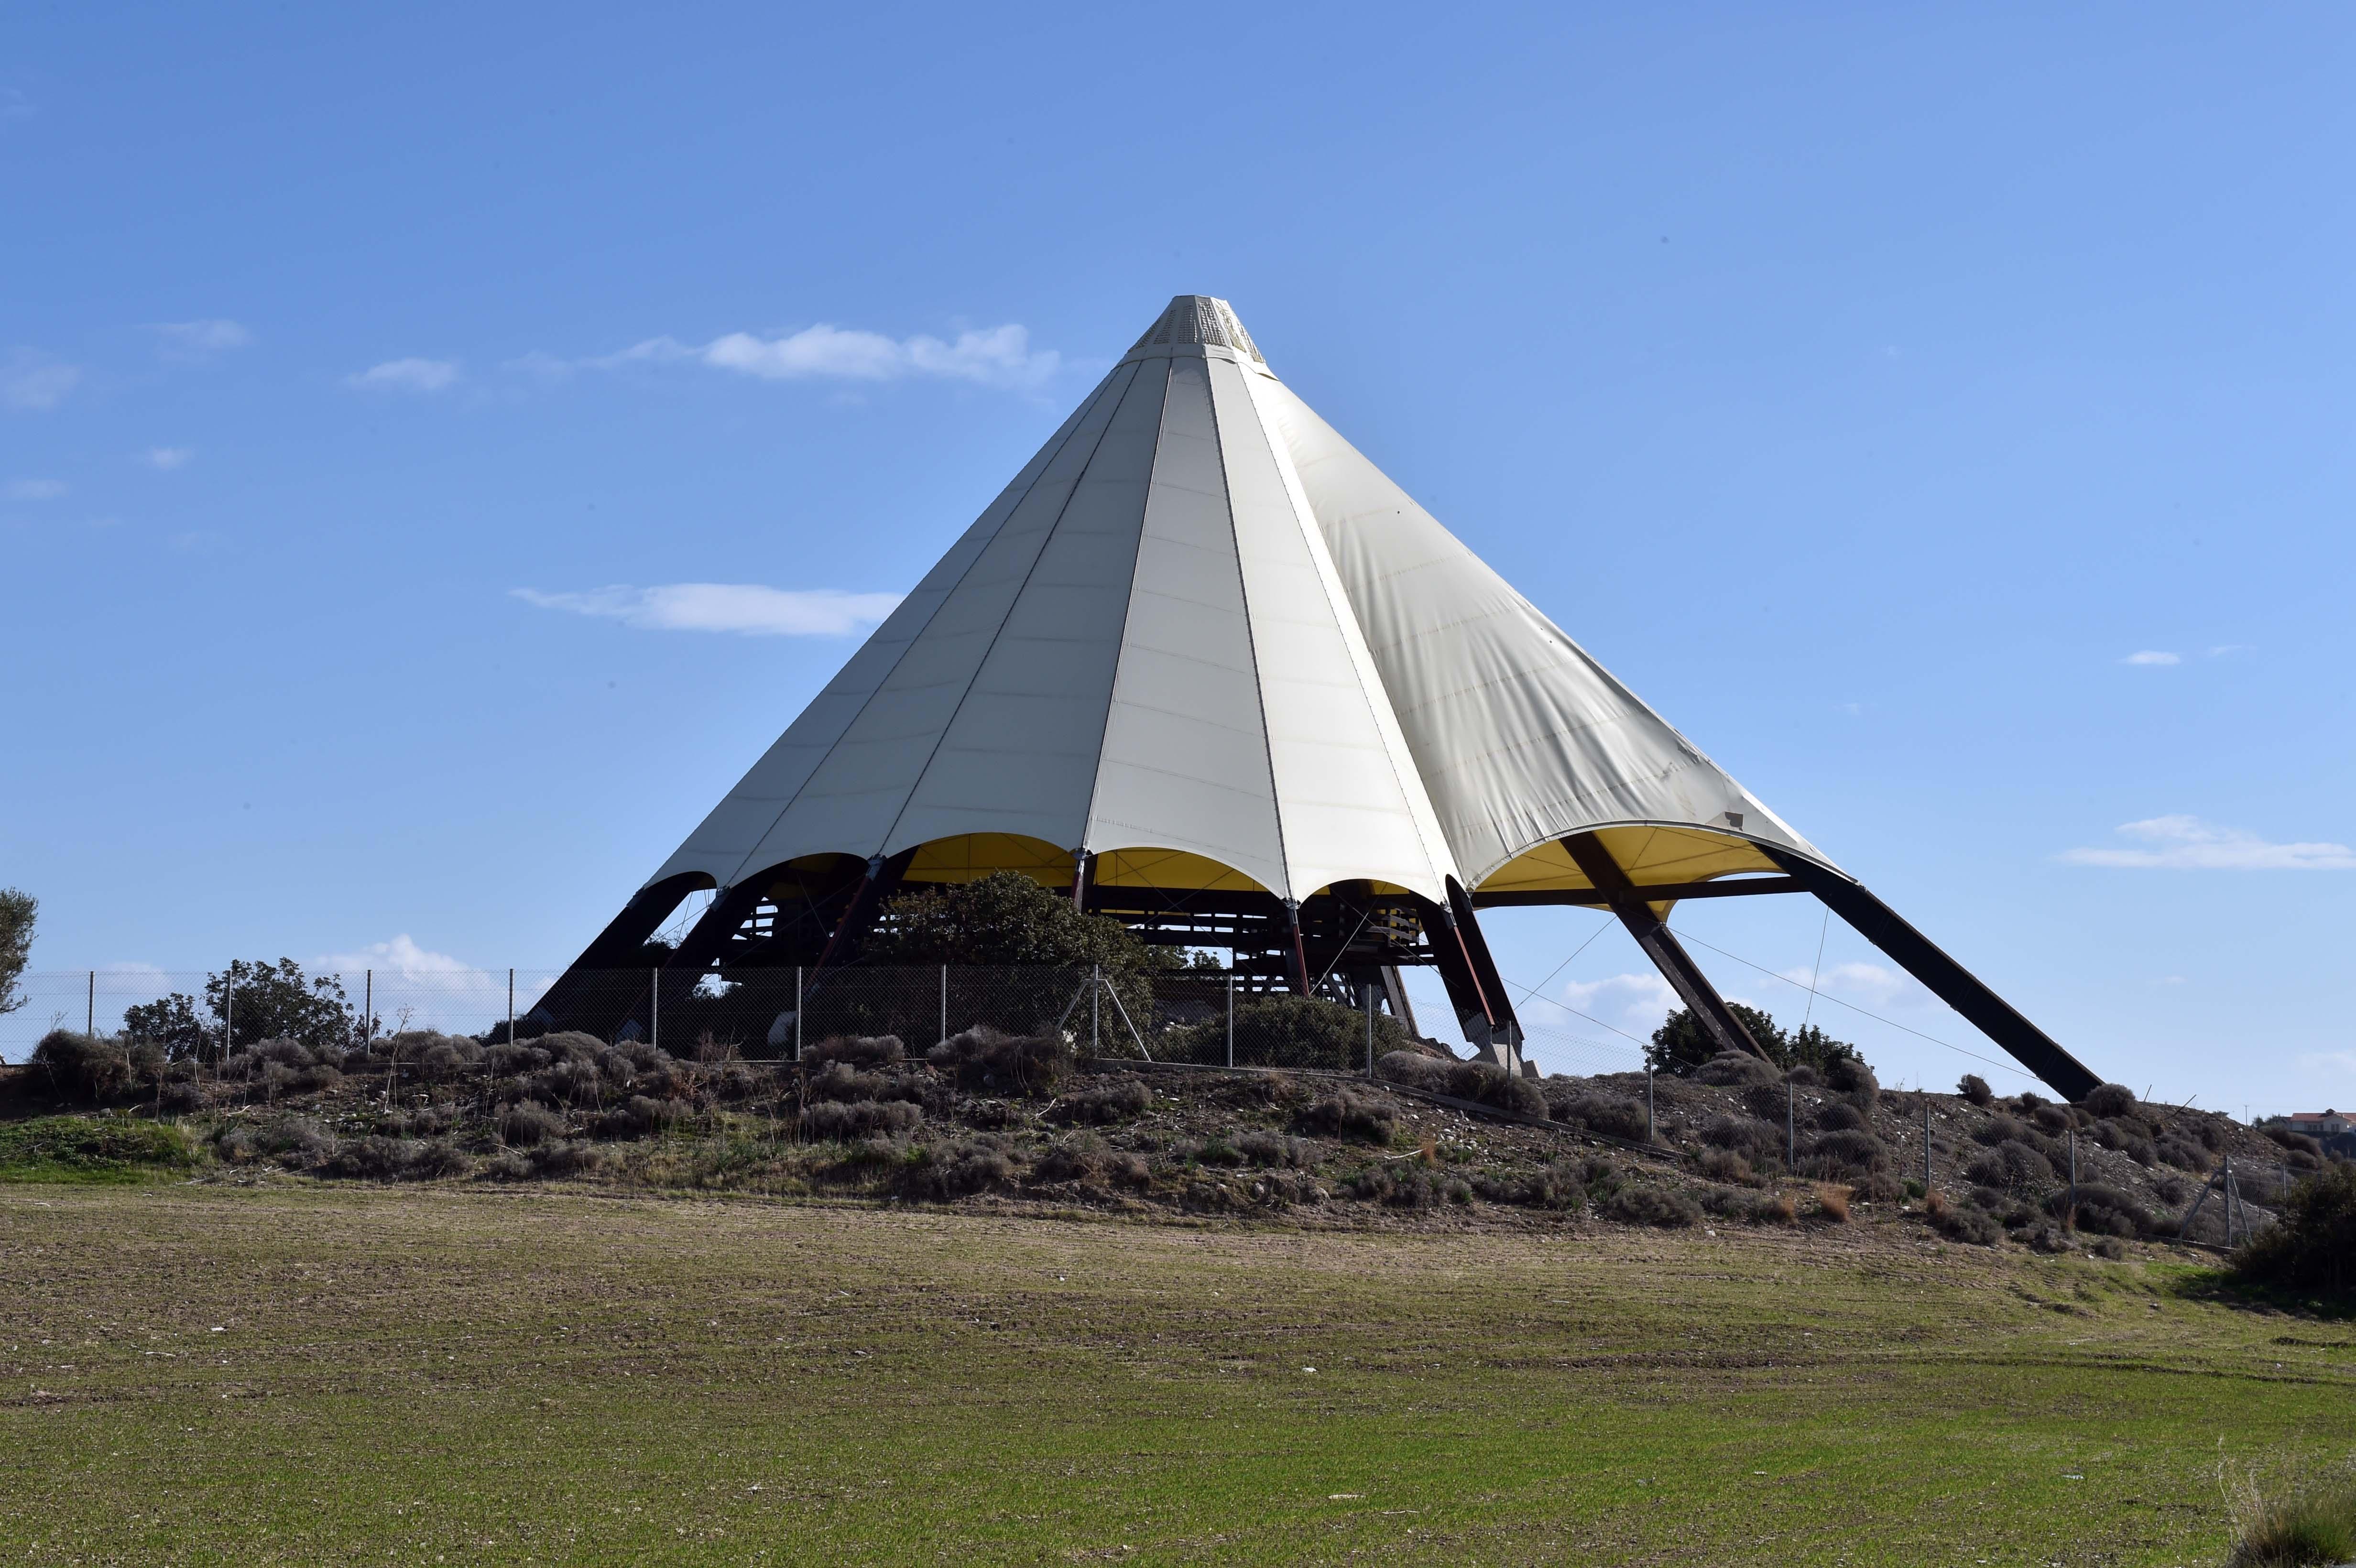 Kalavasos-Tent Archaeological Site